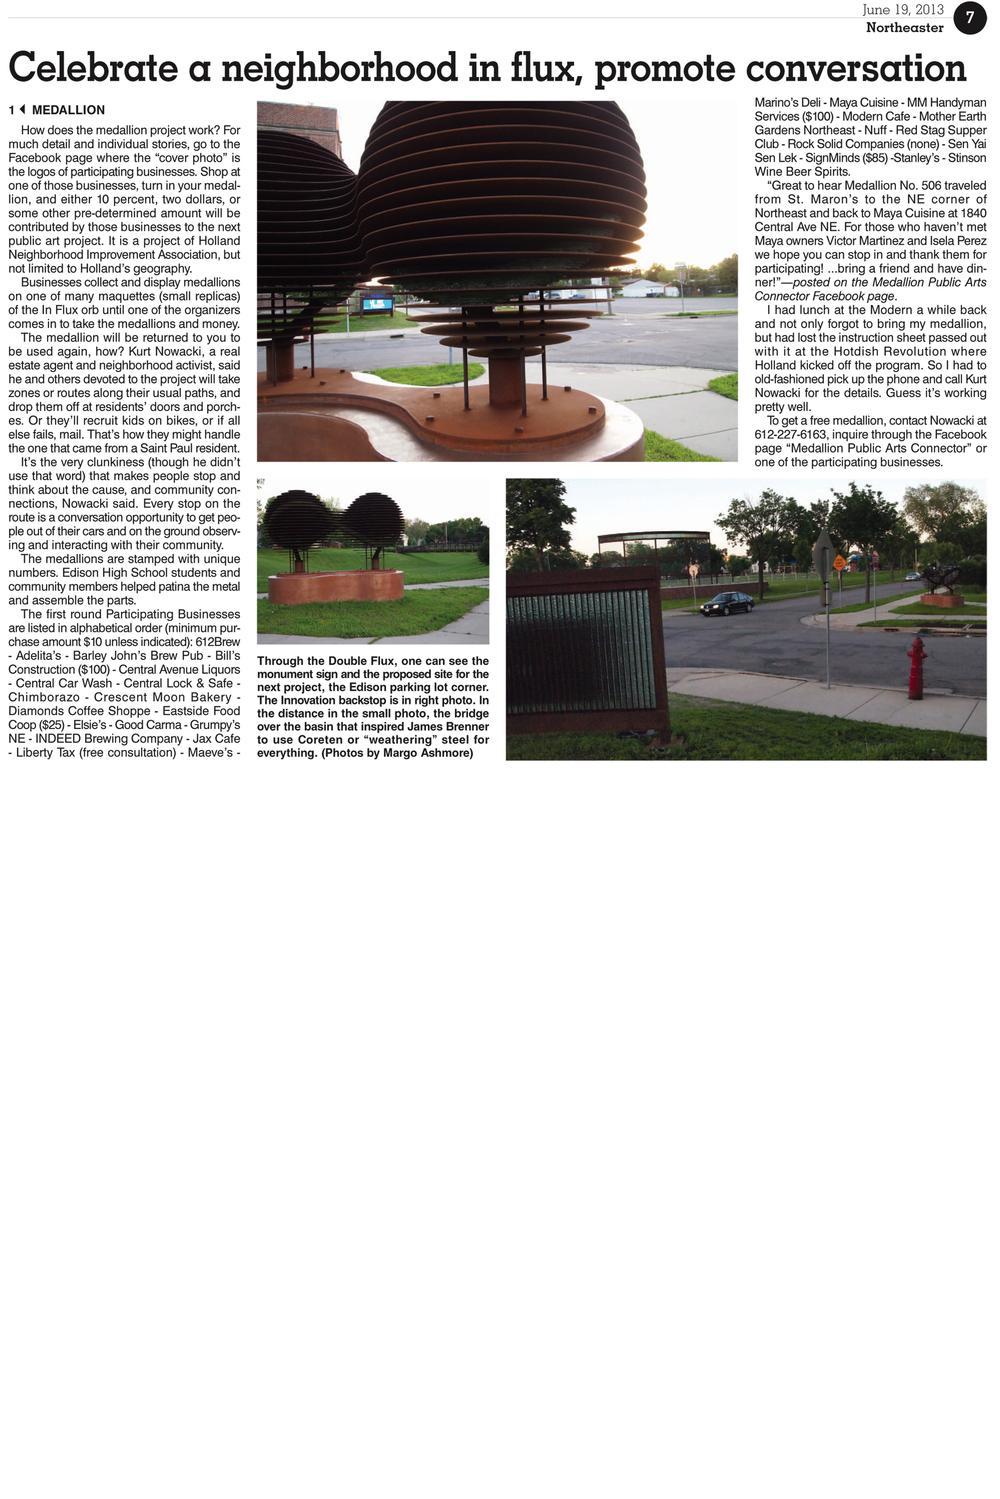 6-19-13 NE Page 7.jpg